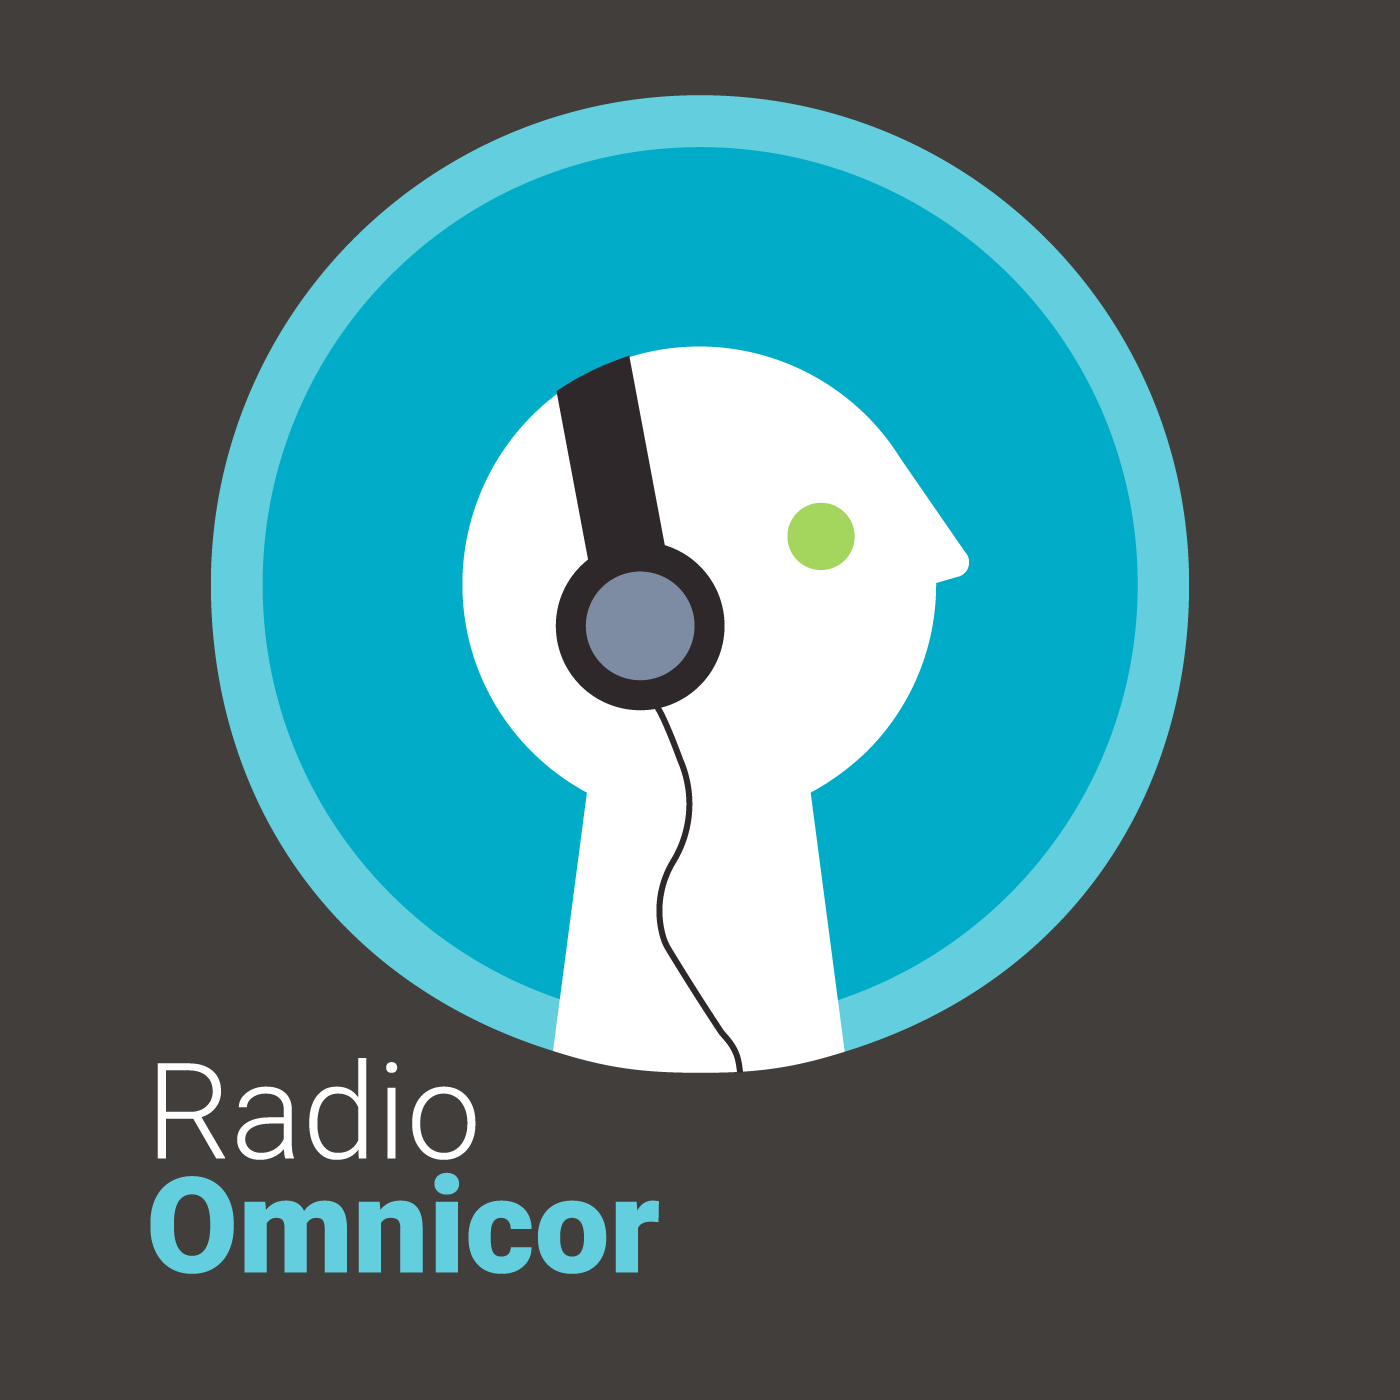 Radio Omnicor show art